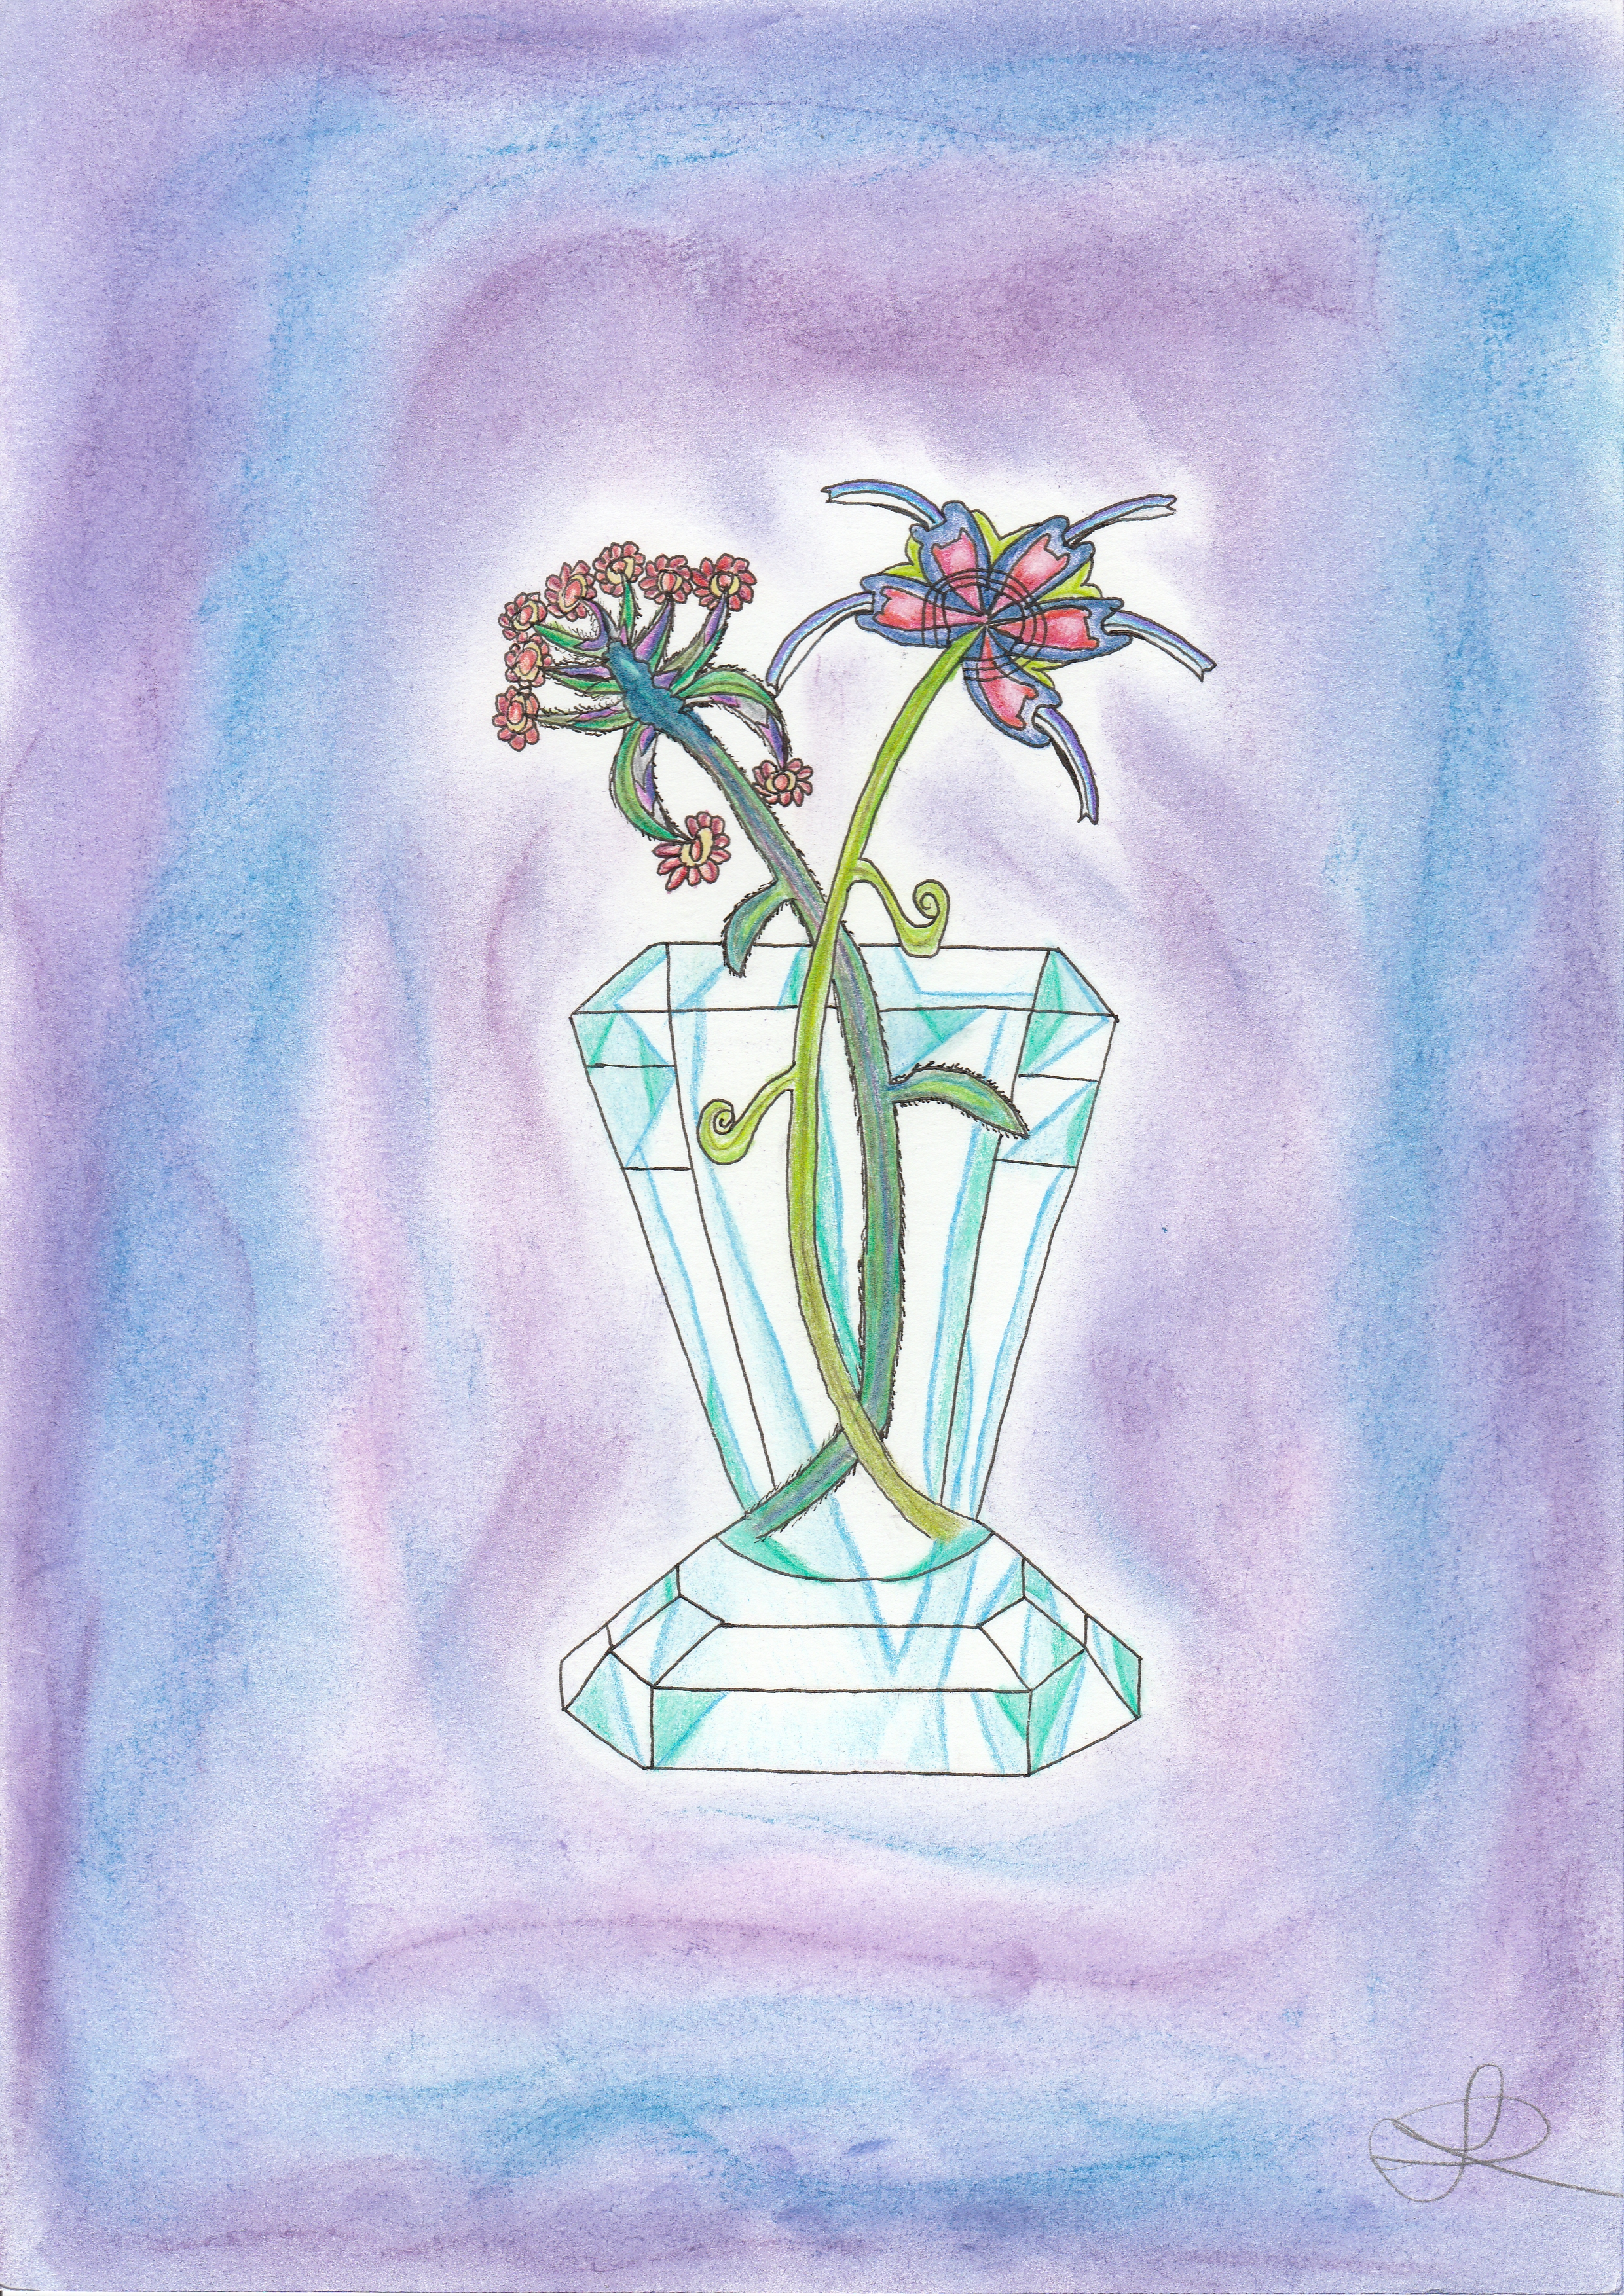 Dessin Fleurs dans un vase en verre de Nimimura